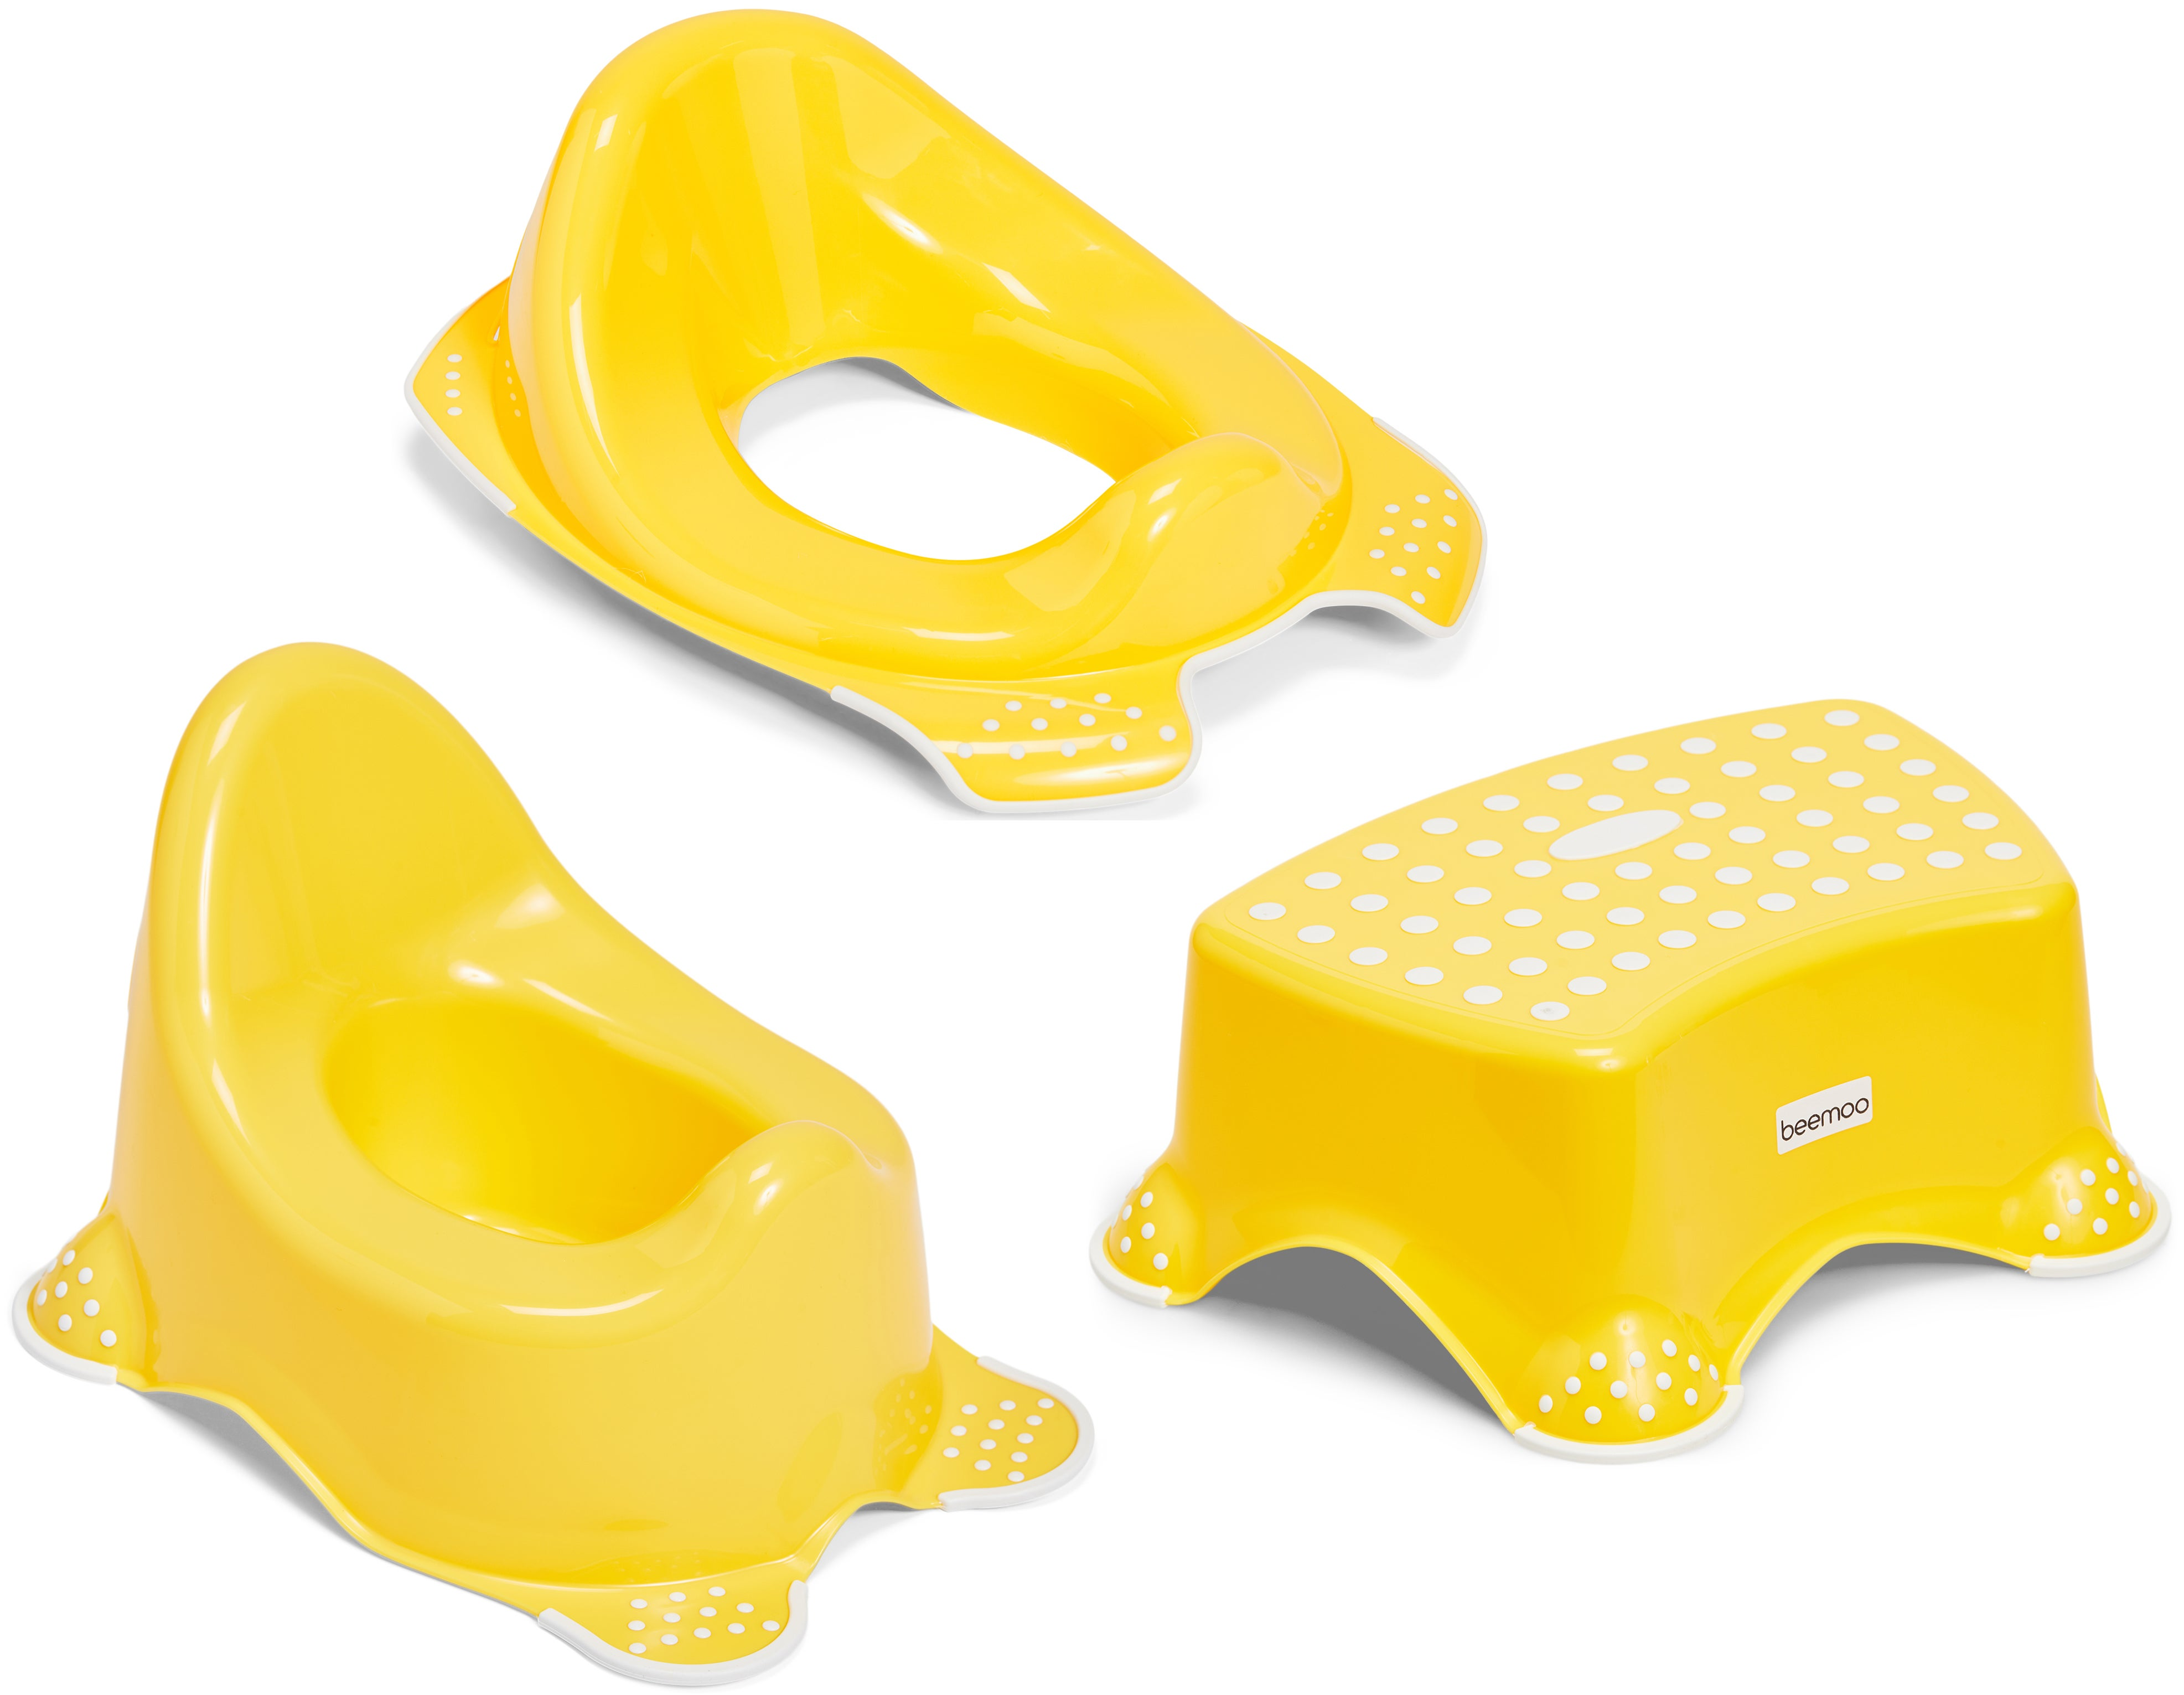 Beemoo Care Liukuestepotta, WC-Supistaja ja Korokejakkara, Capri Yellow